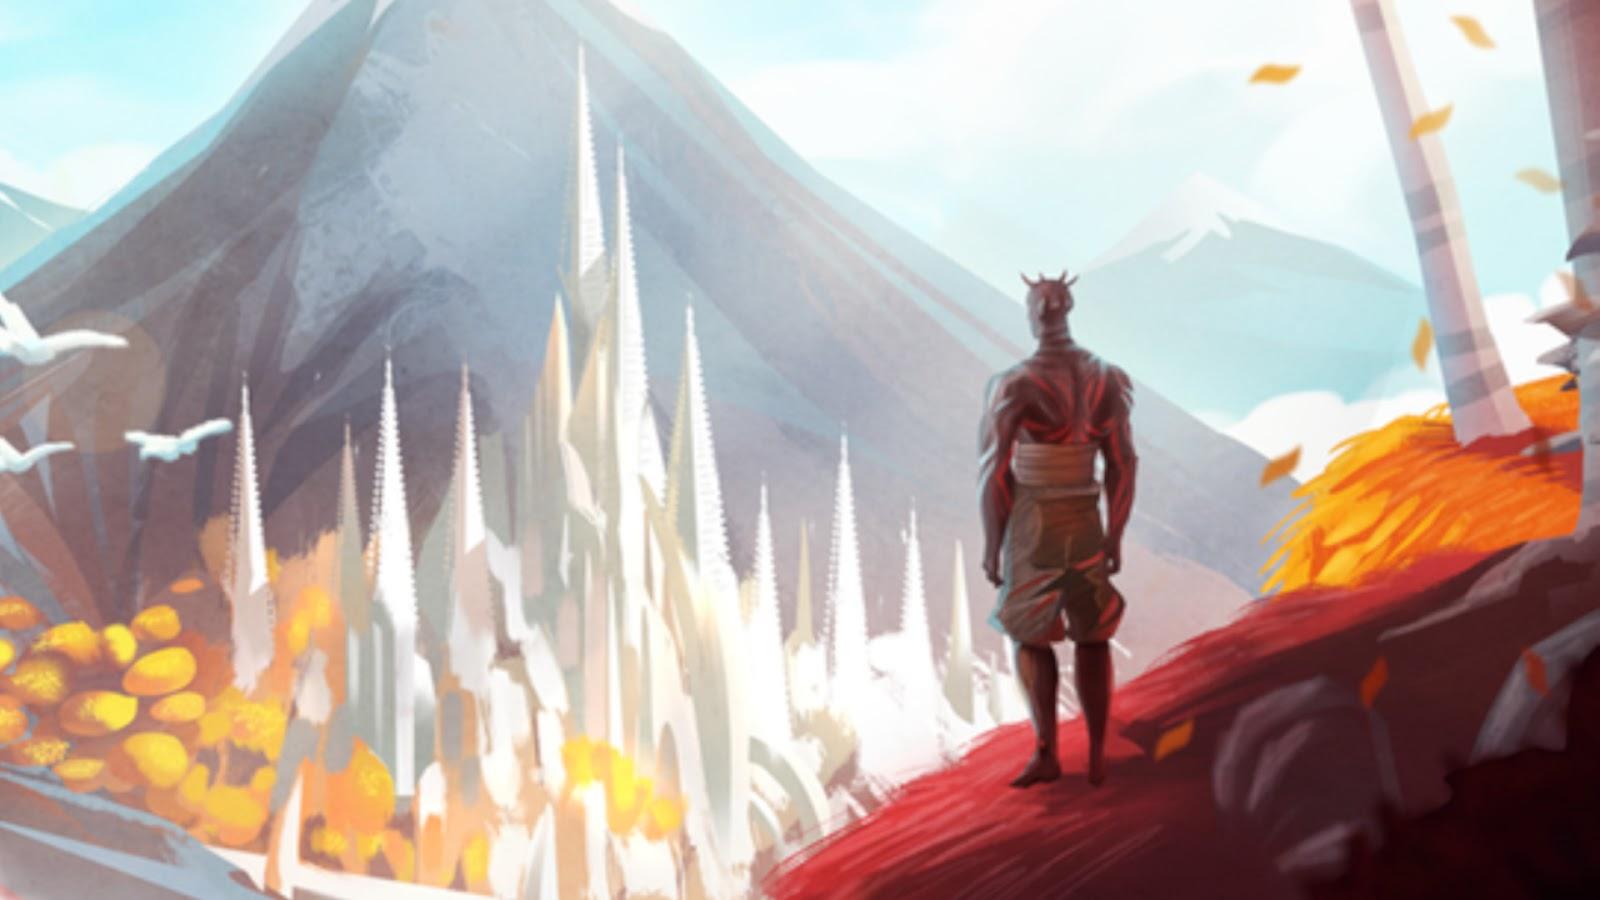 Kickstarter Highlights - Kaldori